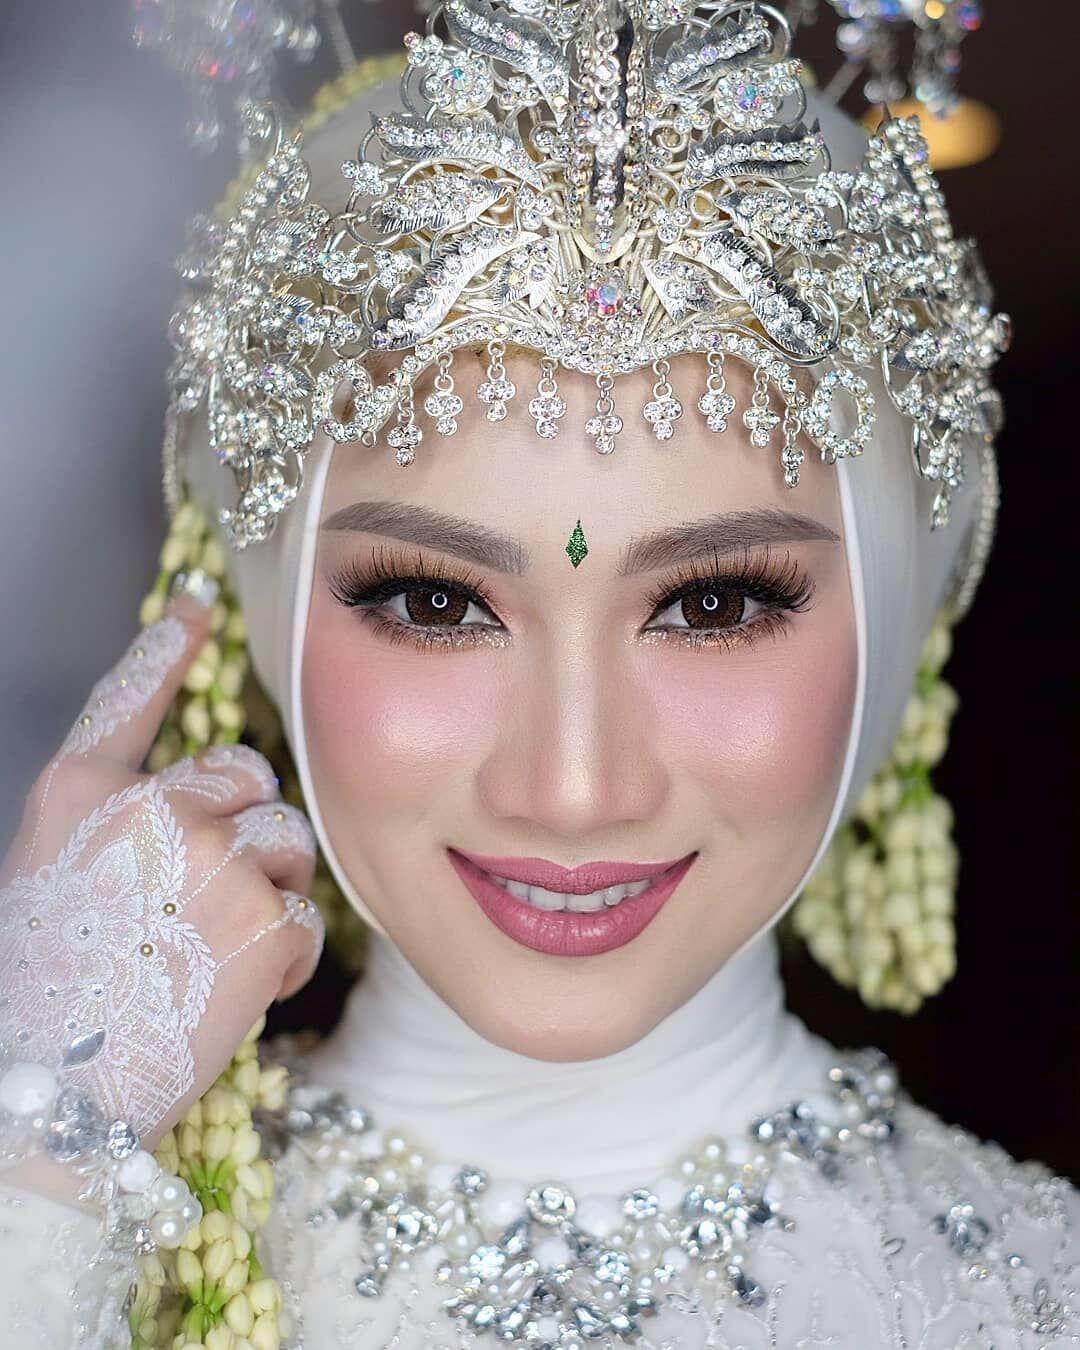 Inspirasi Pernikahan Sunda ala Melody Eks JKT48, Suci nan Sakral